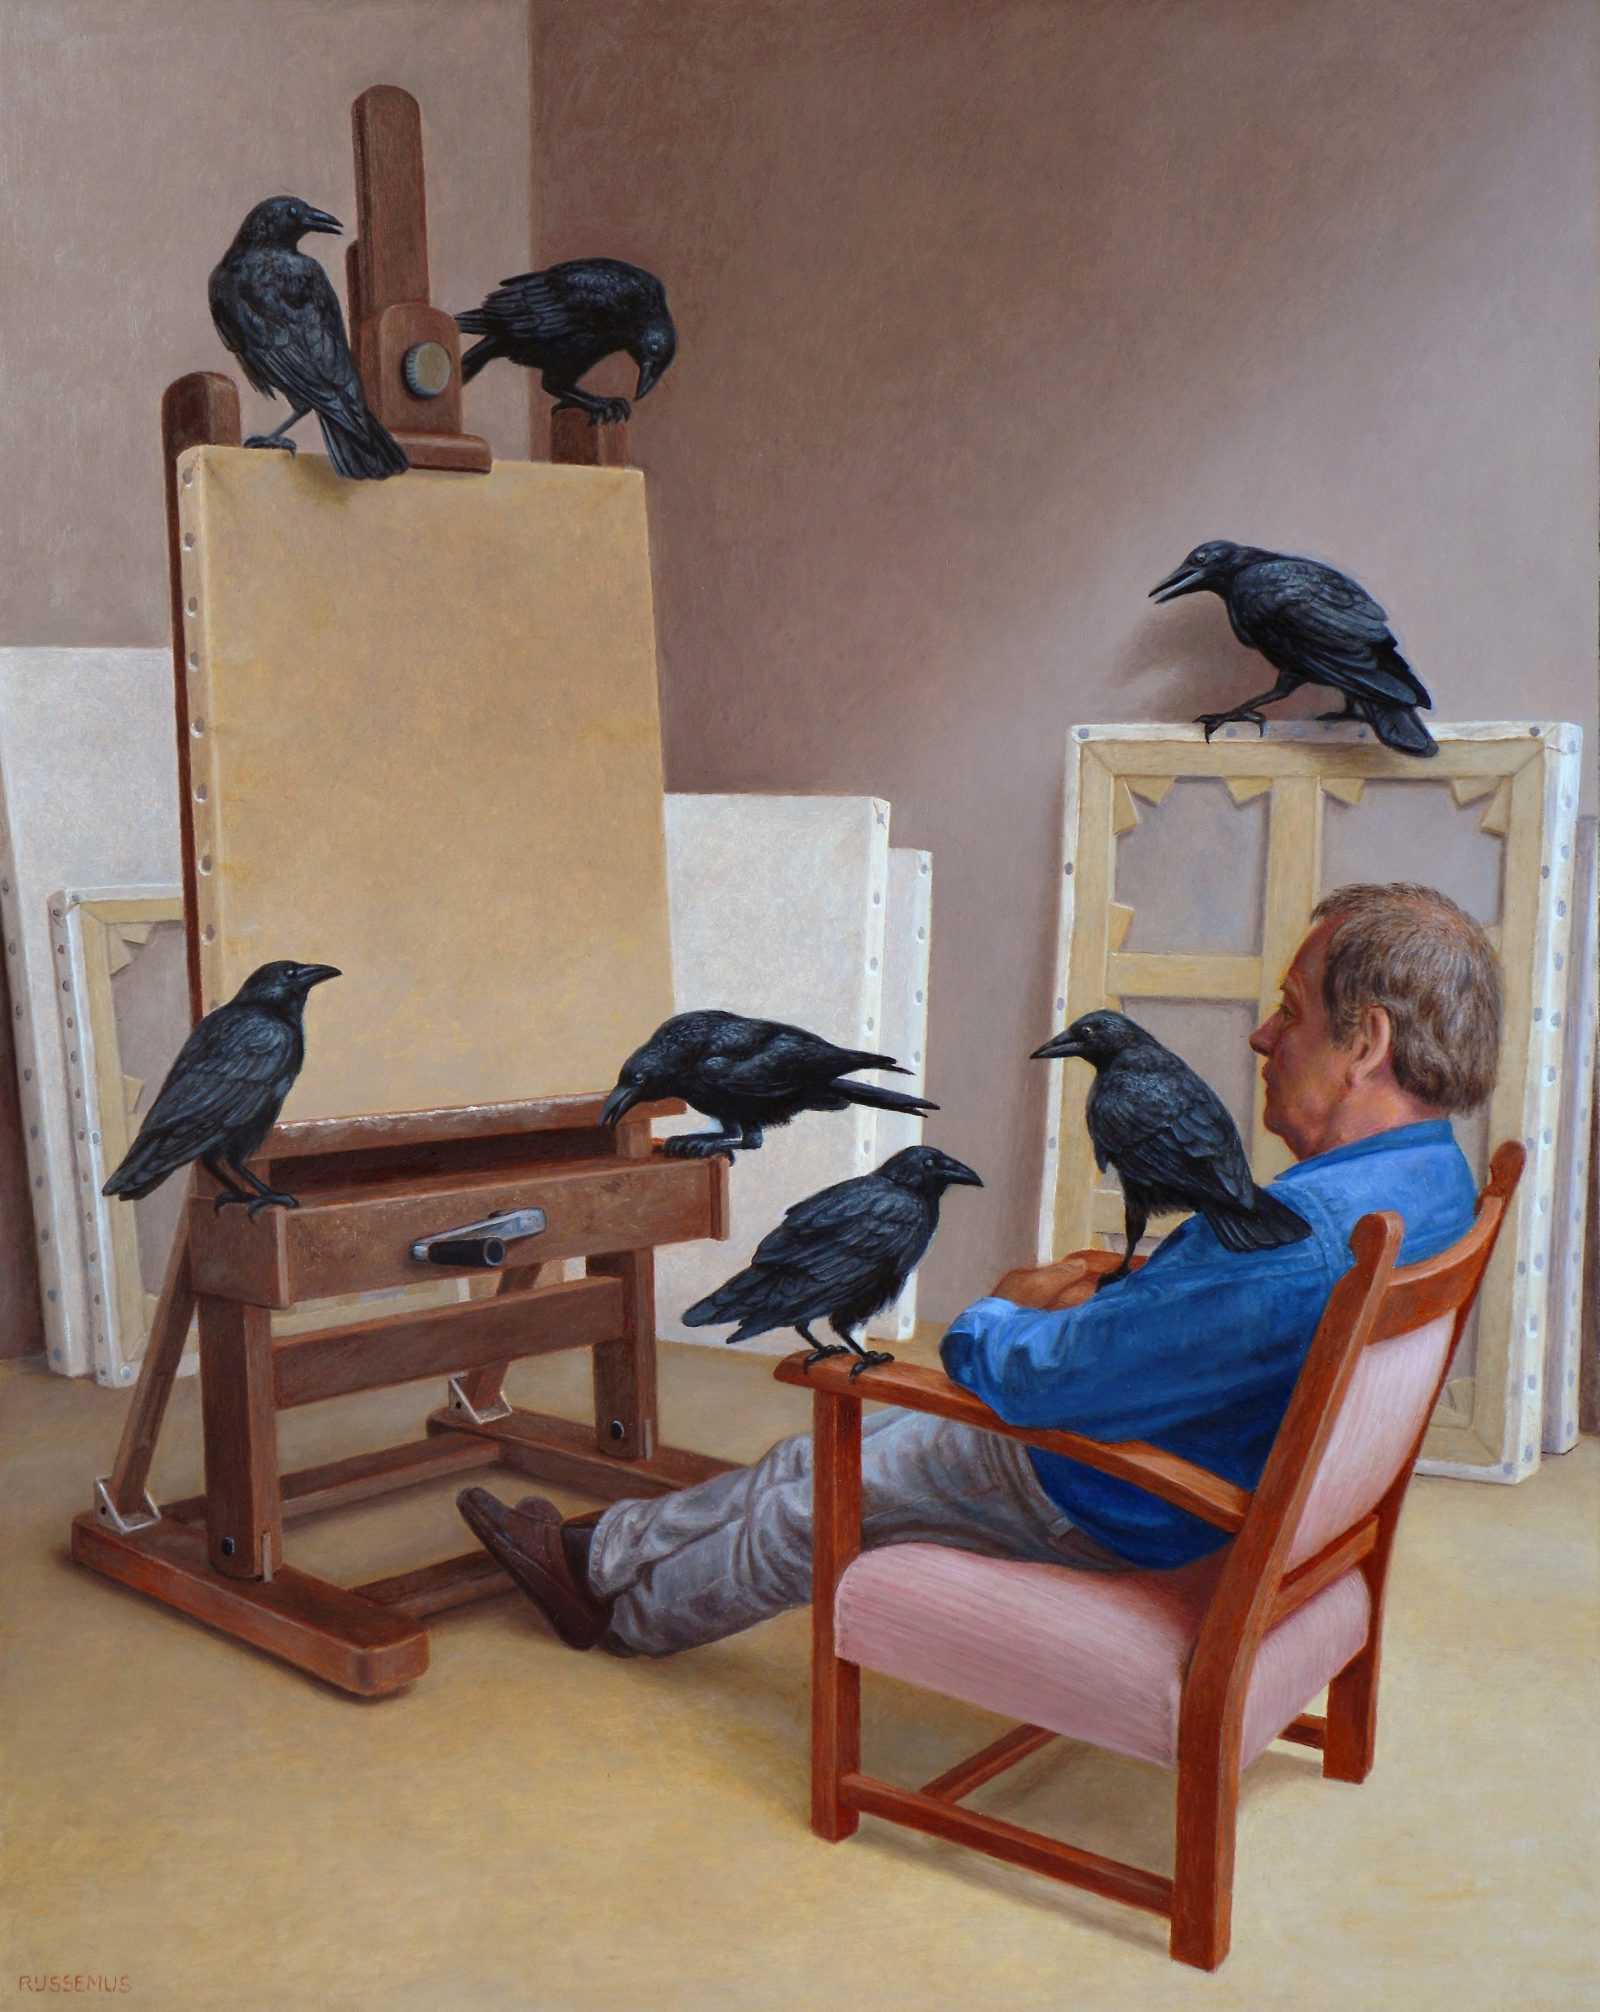 Painter's block